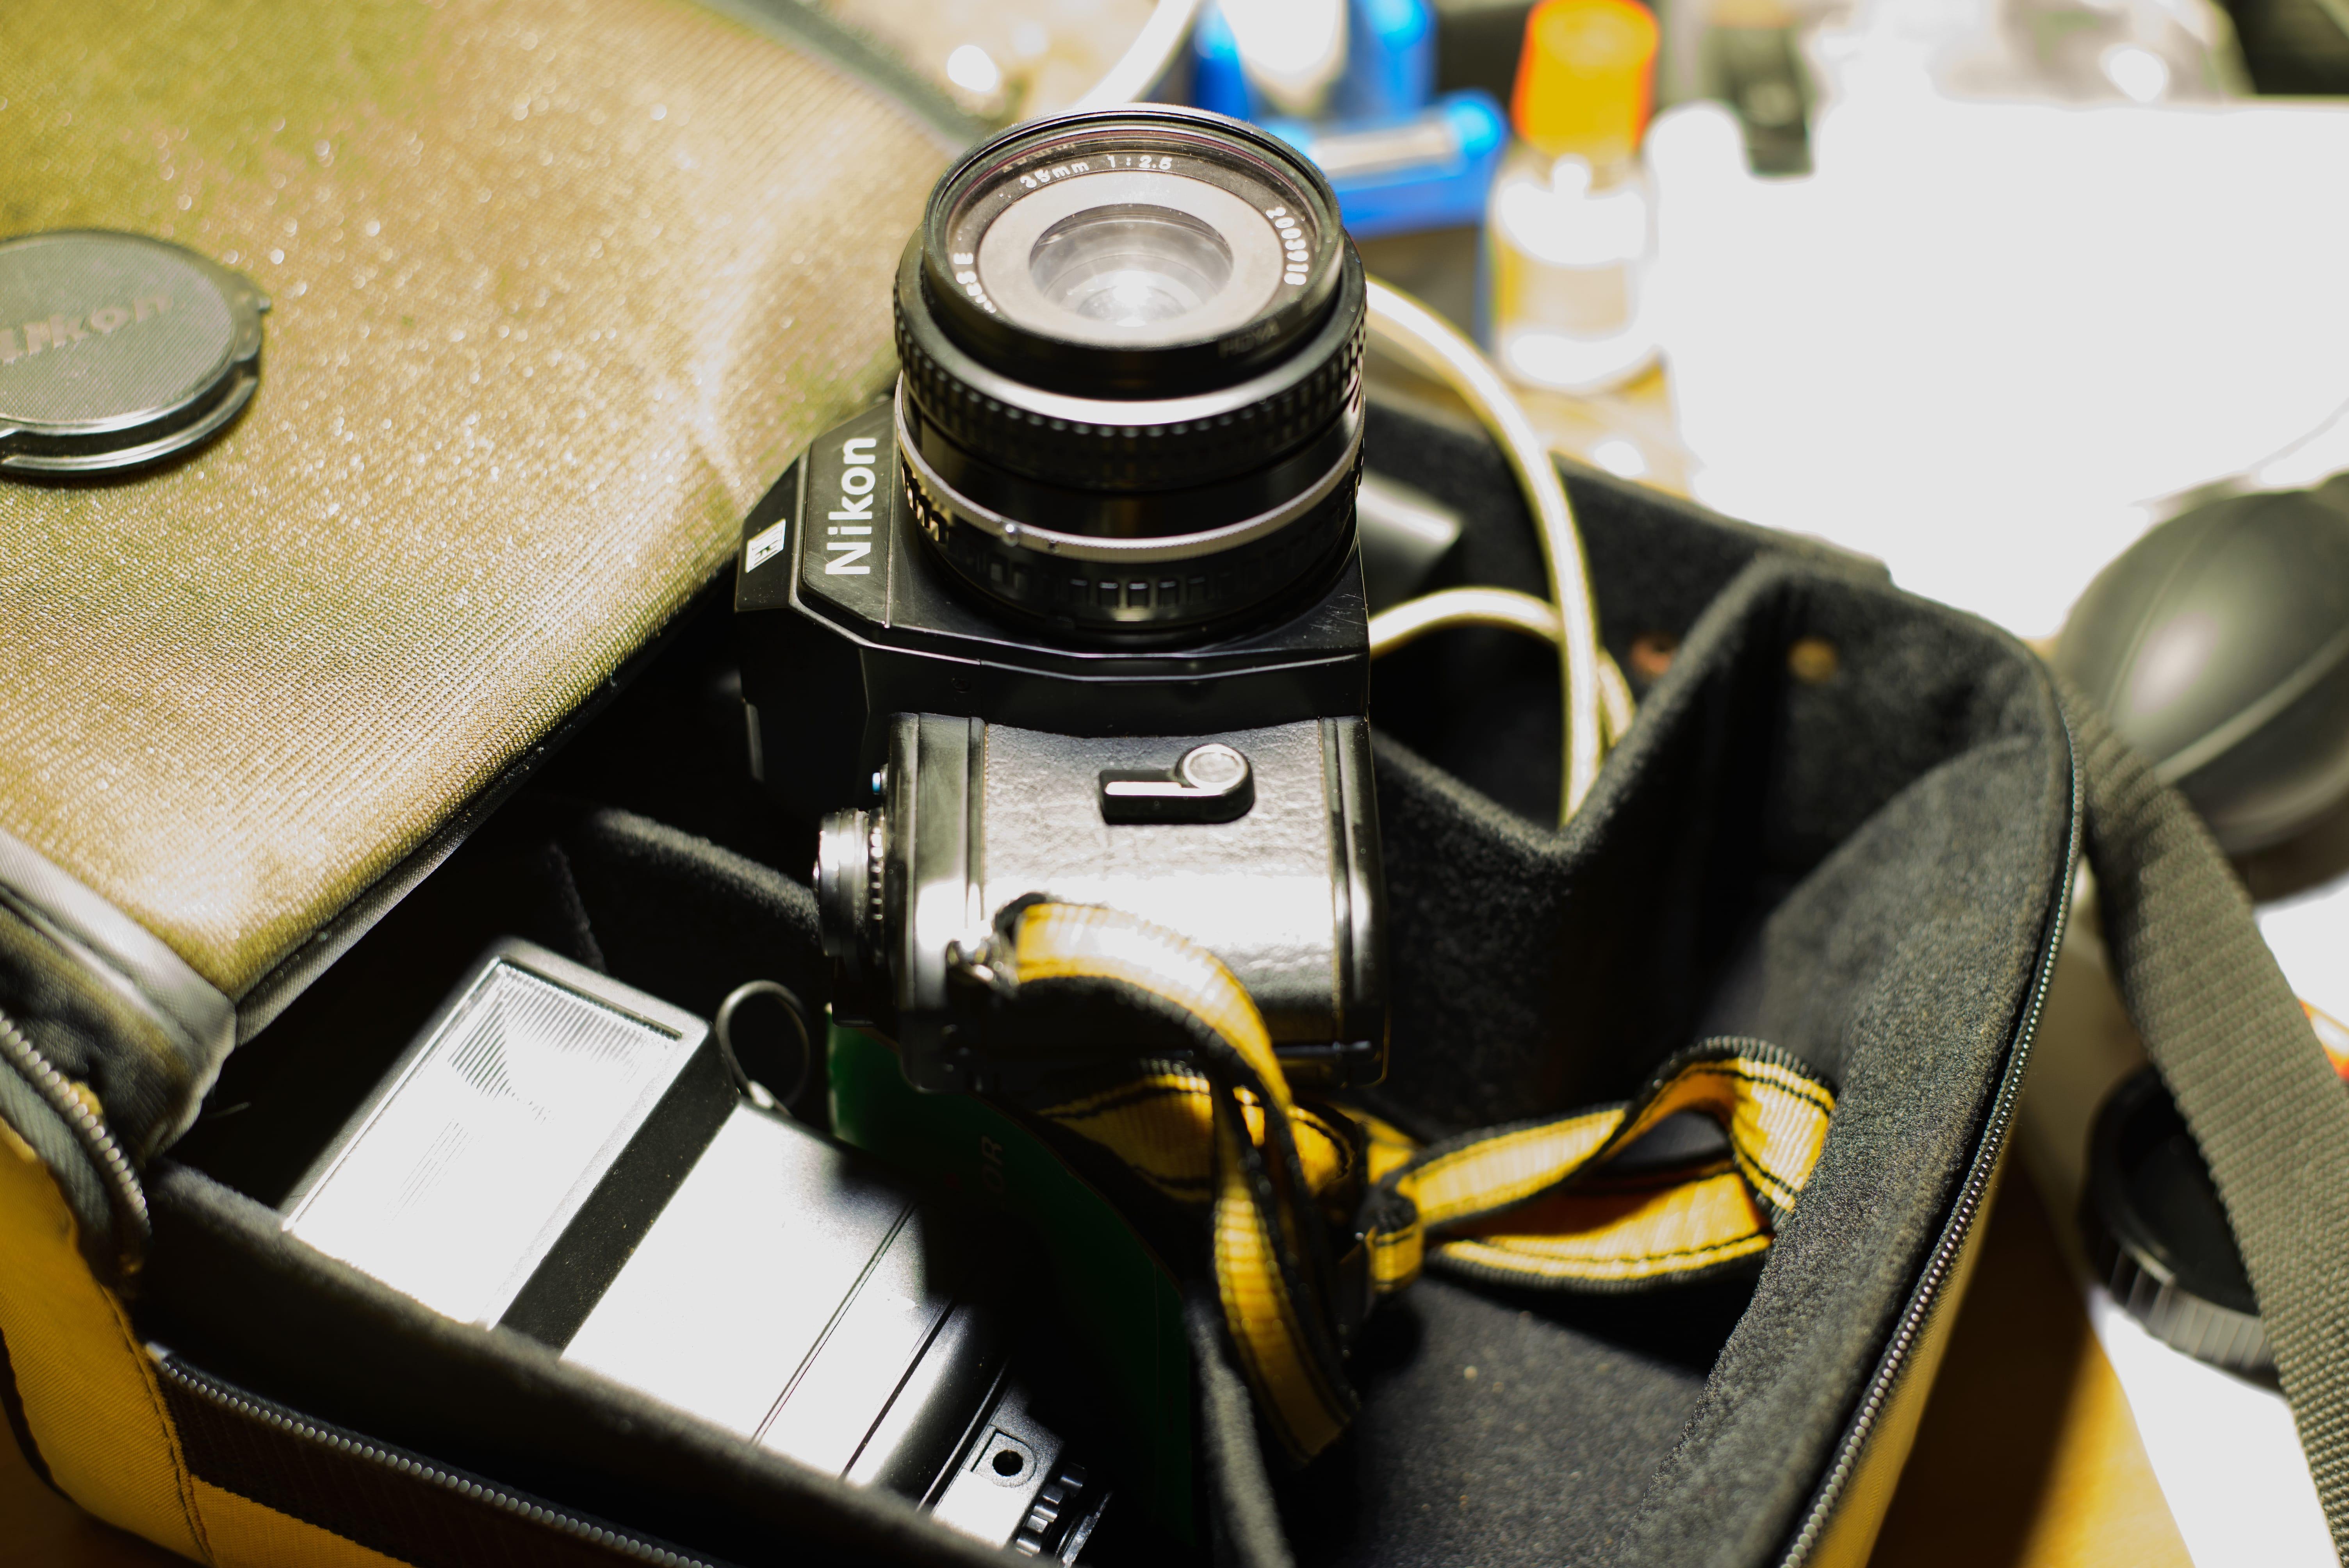 Nikon EM SLR & Nissin 26A Flash